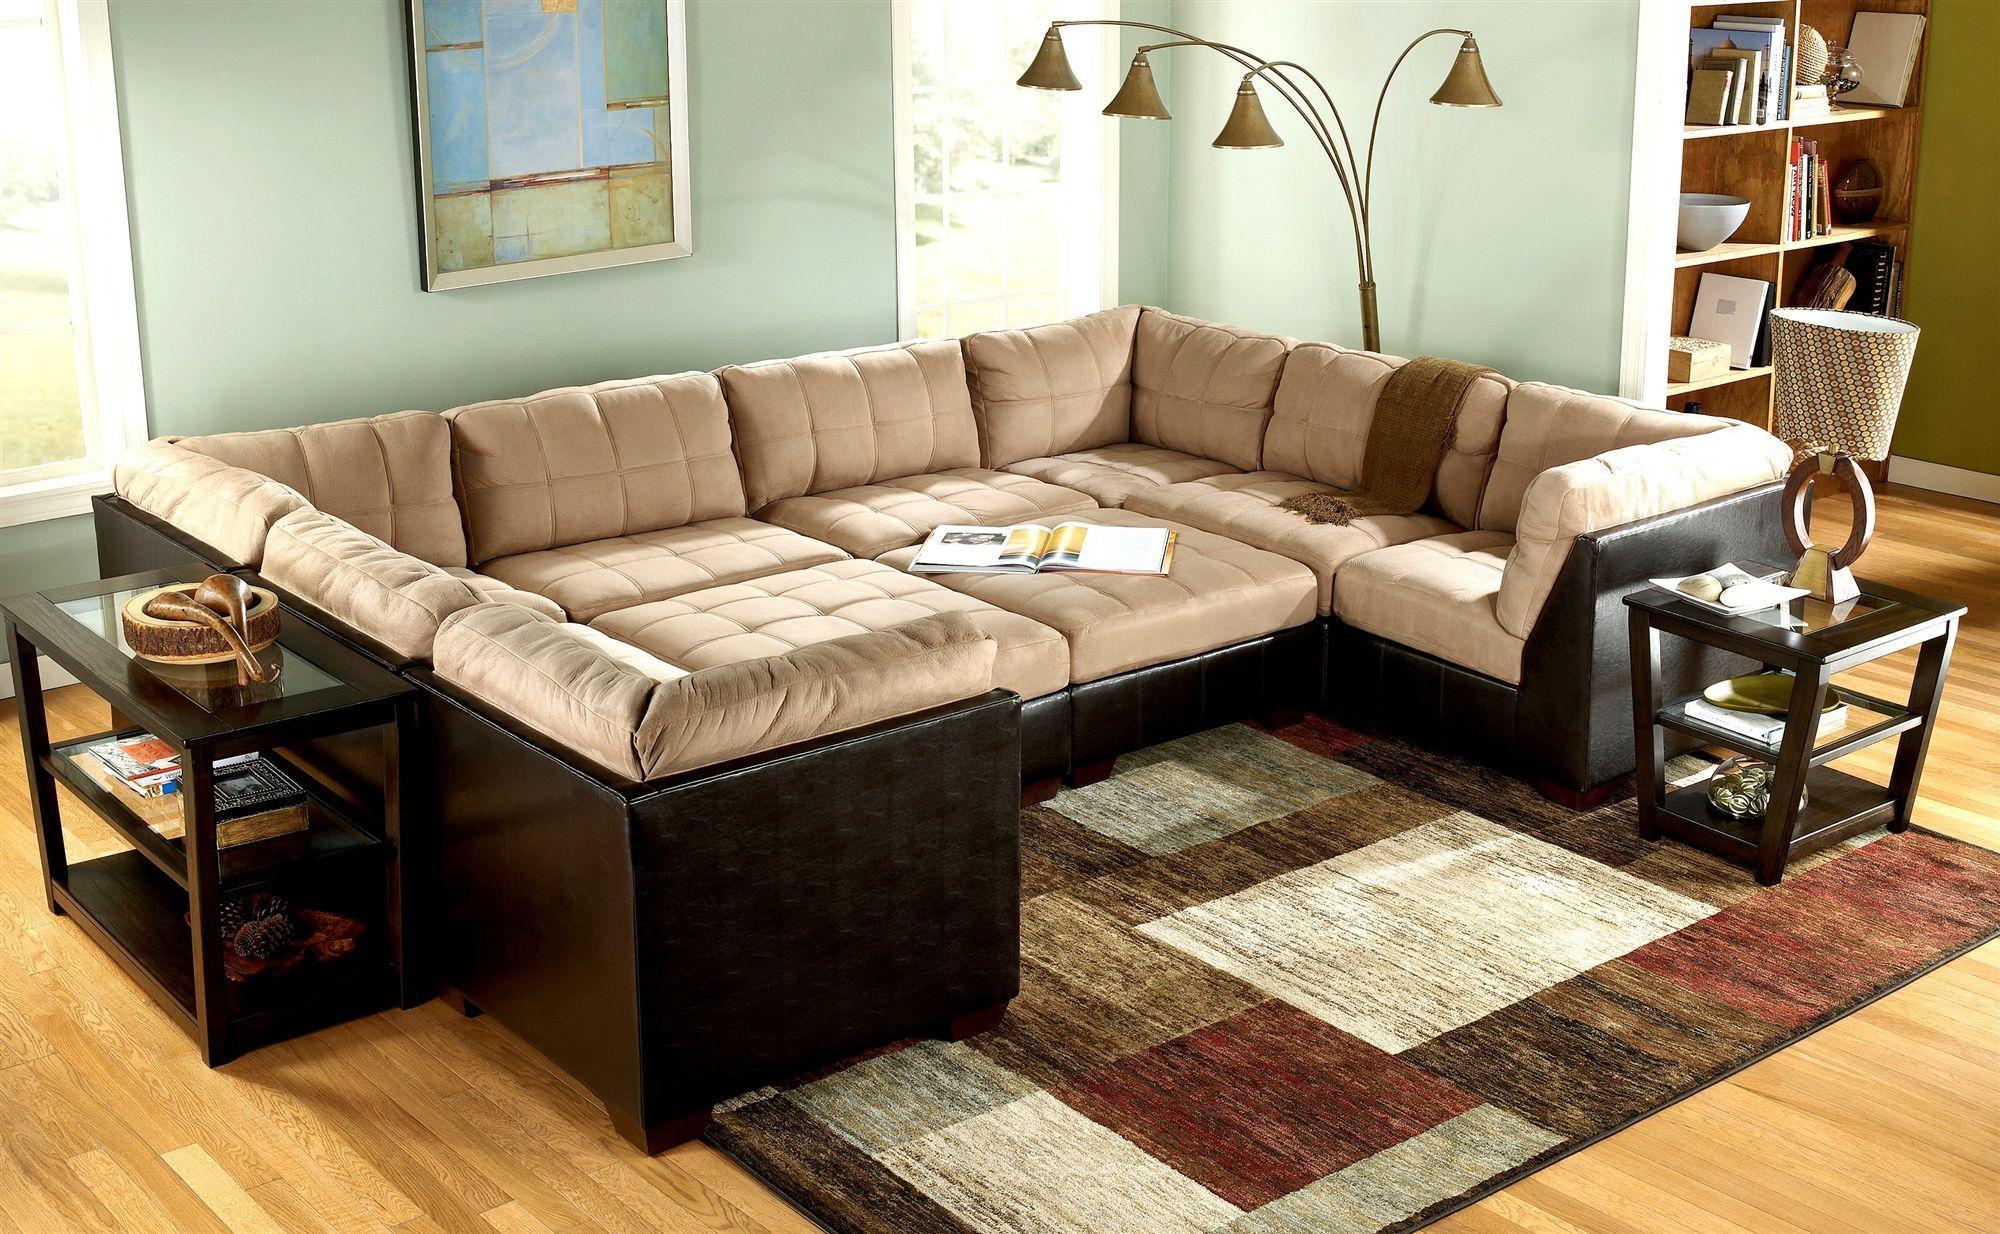 Sofas Center : Buyal Sofa Individual Piecesbuy Las Vegasbuy Inside Individual Piece Sectional Sofas (View 11 of 20)